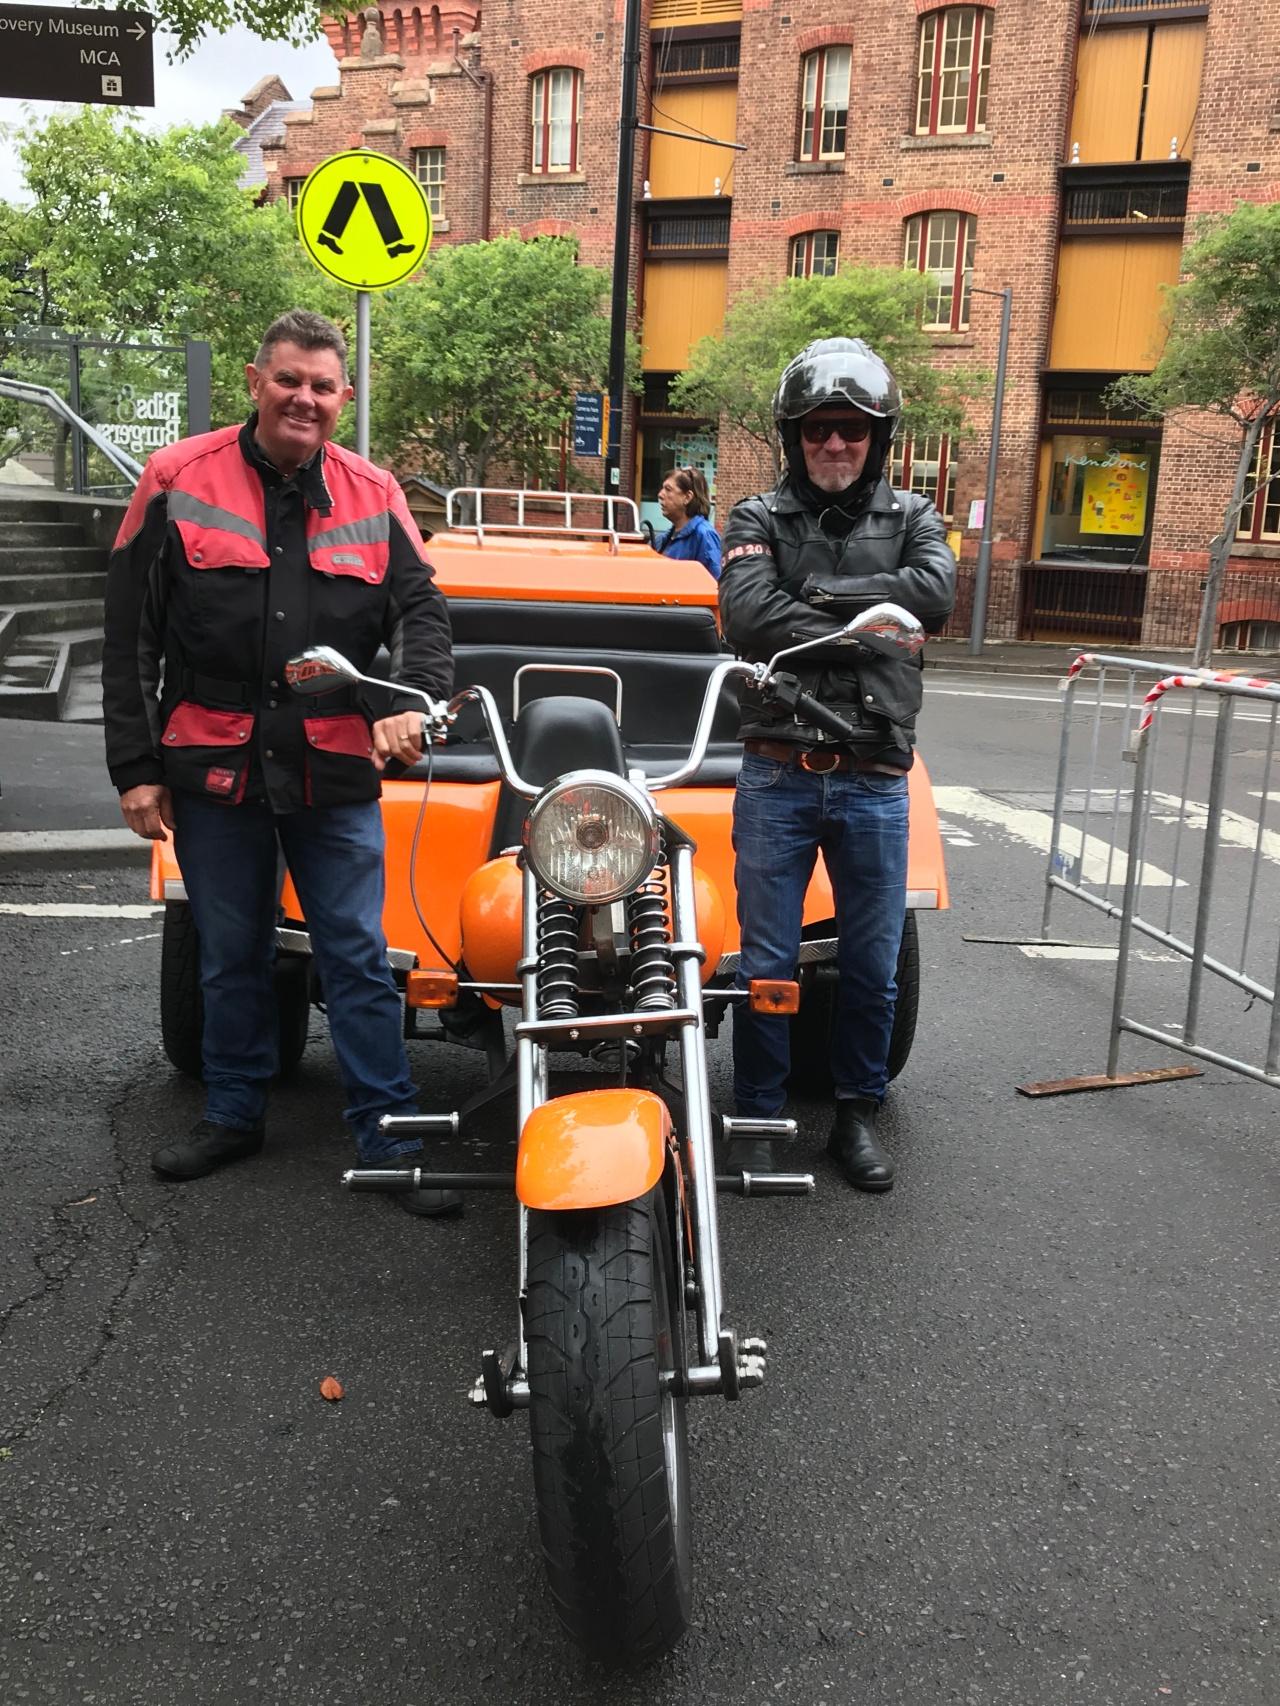 Riding easy on a Harley Trike aroundSydney